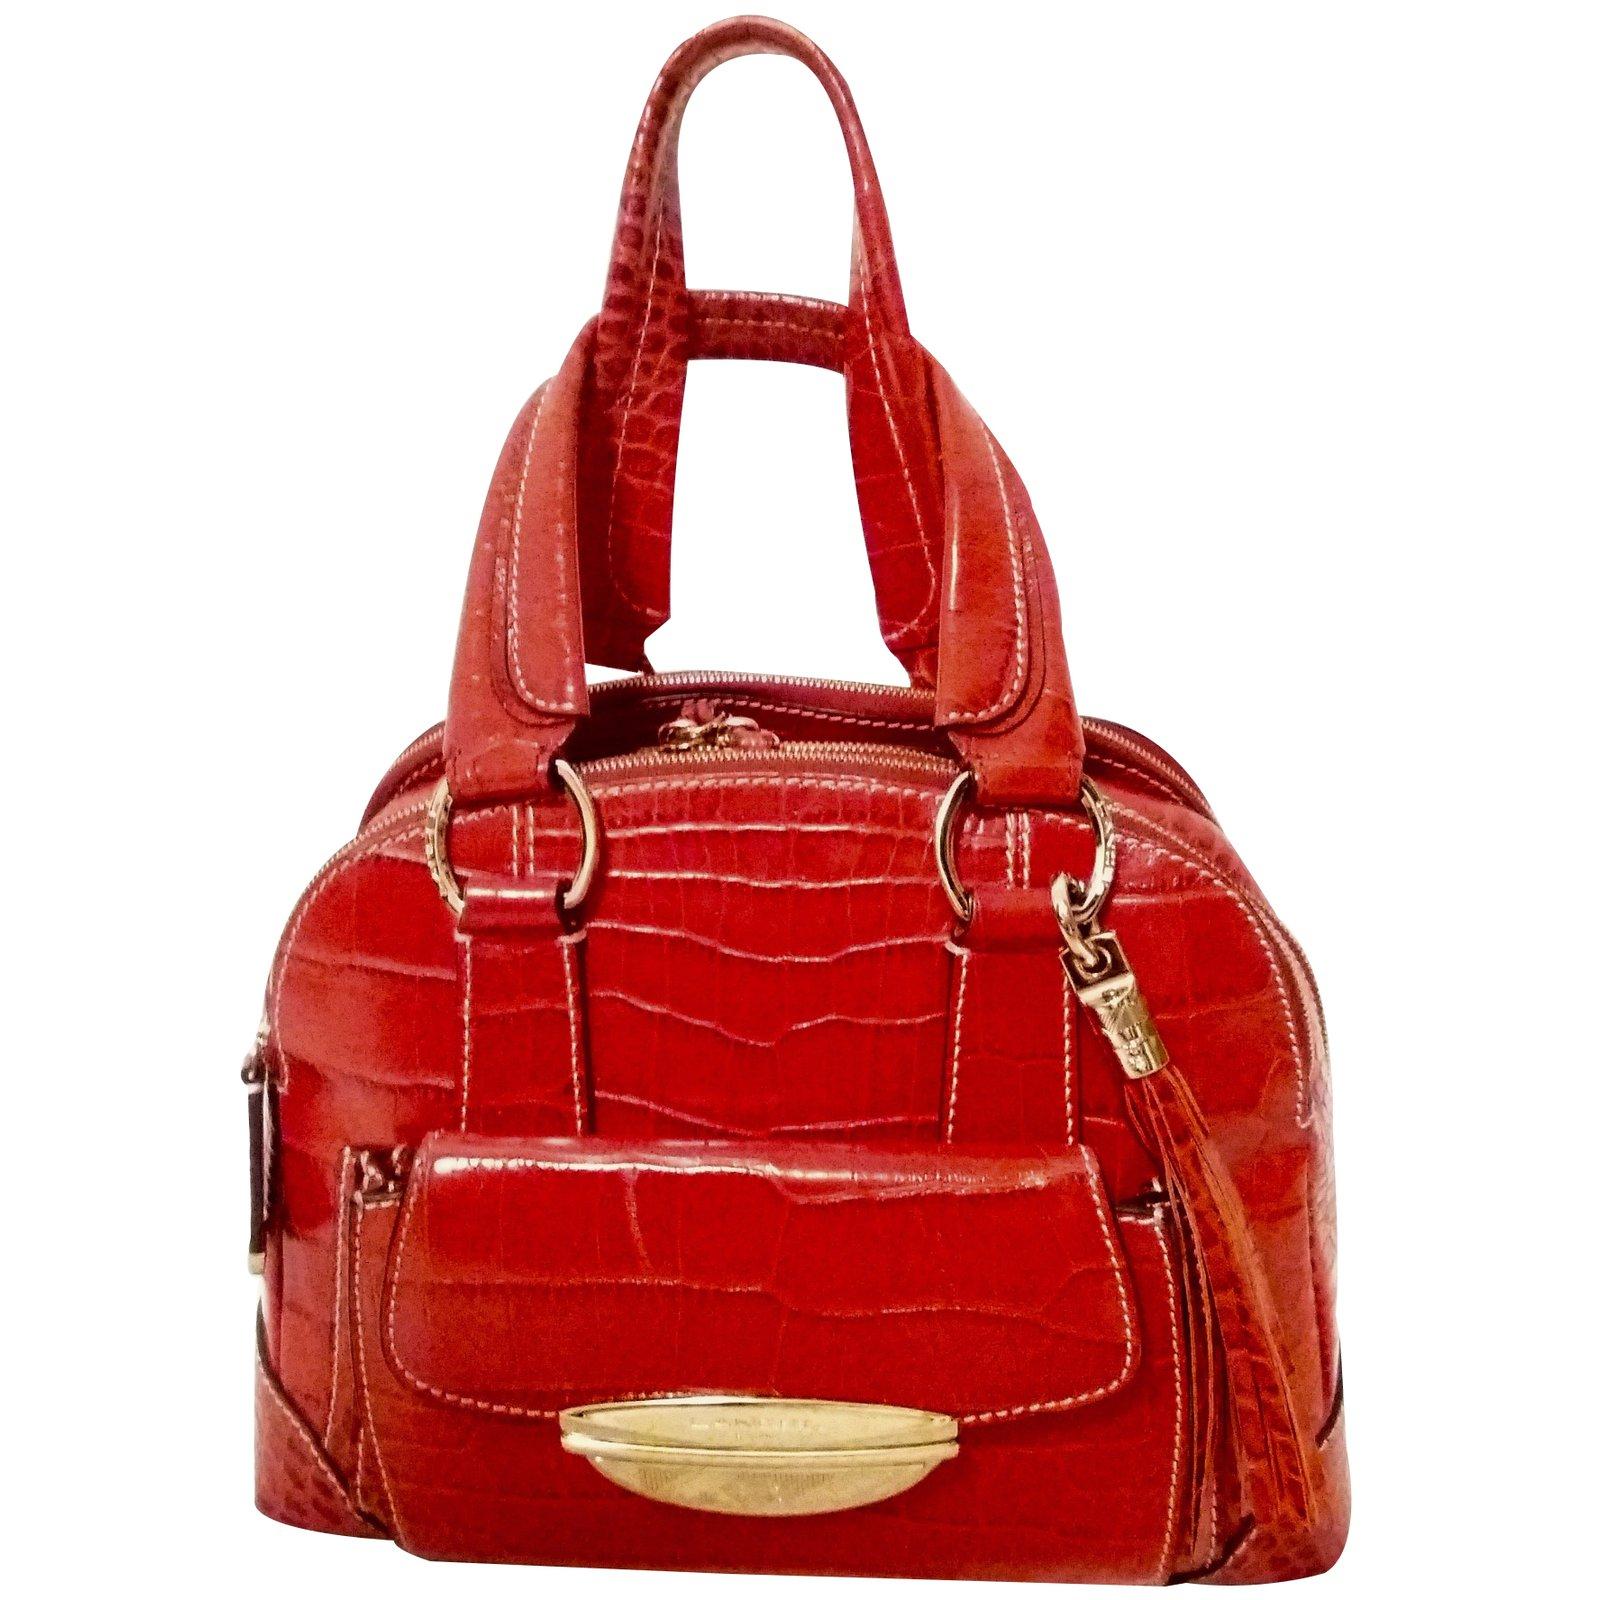 sacs main lancel adjani cuir rouge joli closet. Black Bedroom Furniture Sets. Home Design Ideas